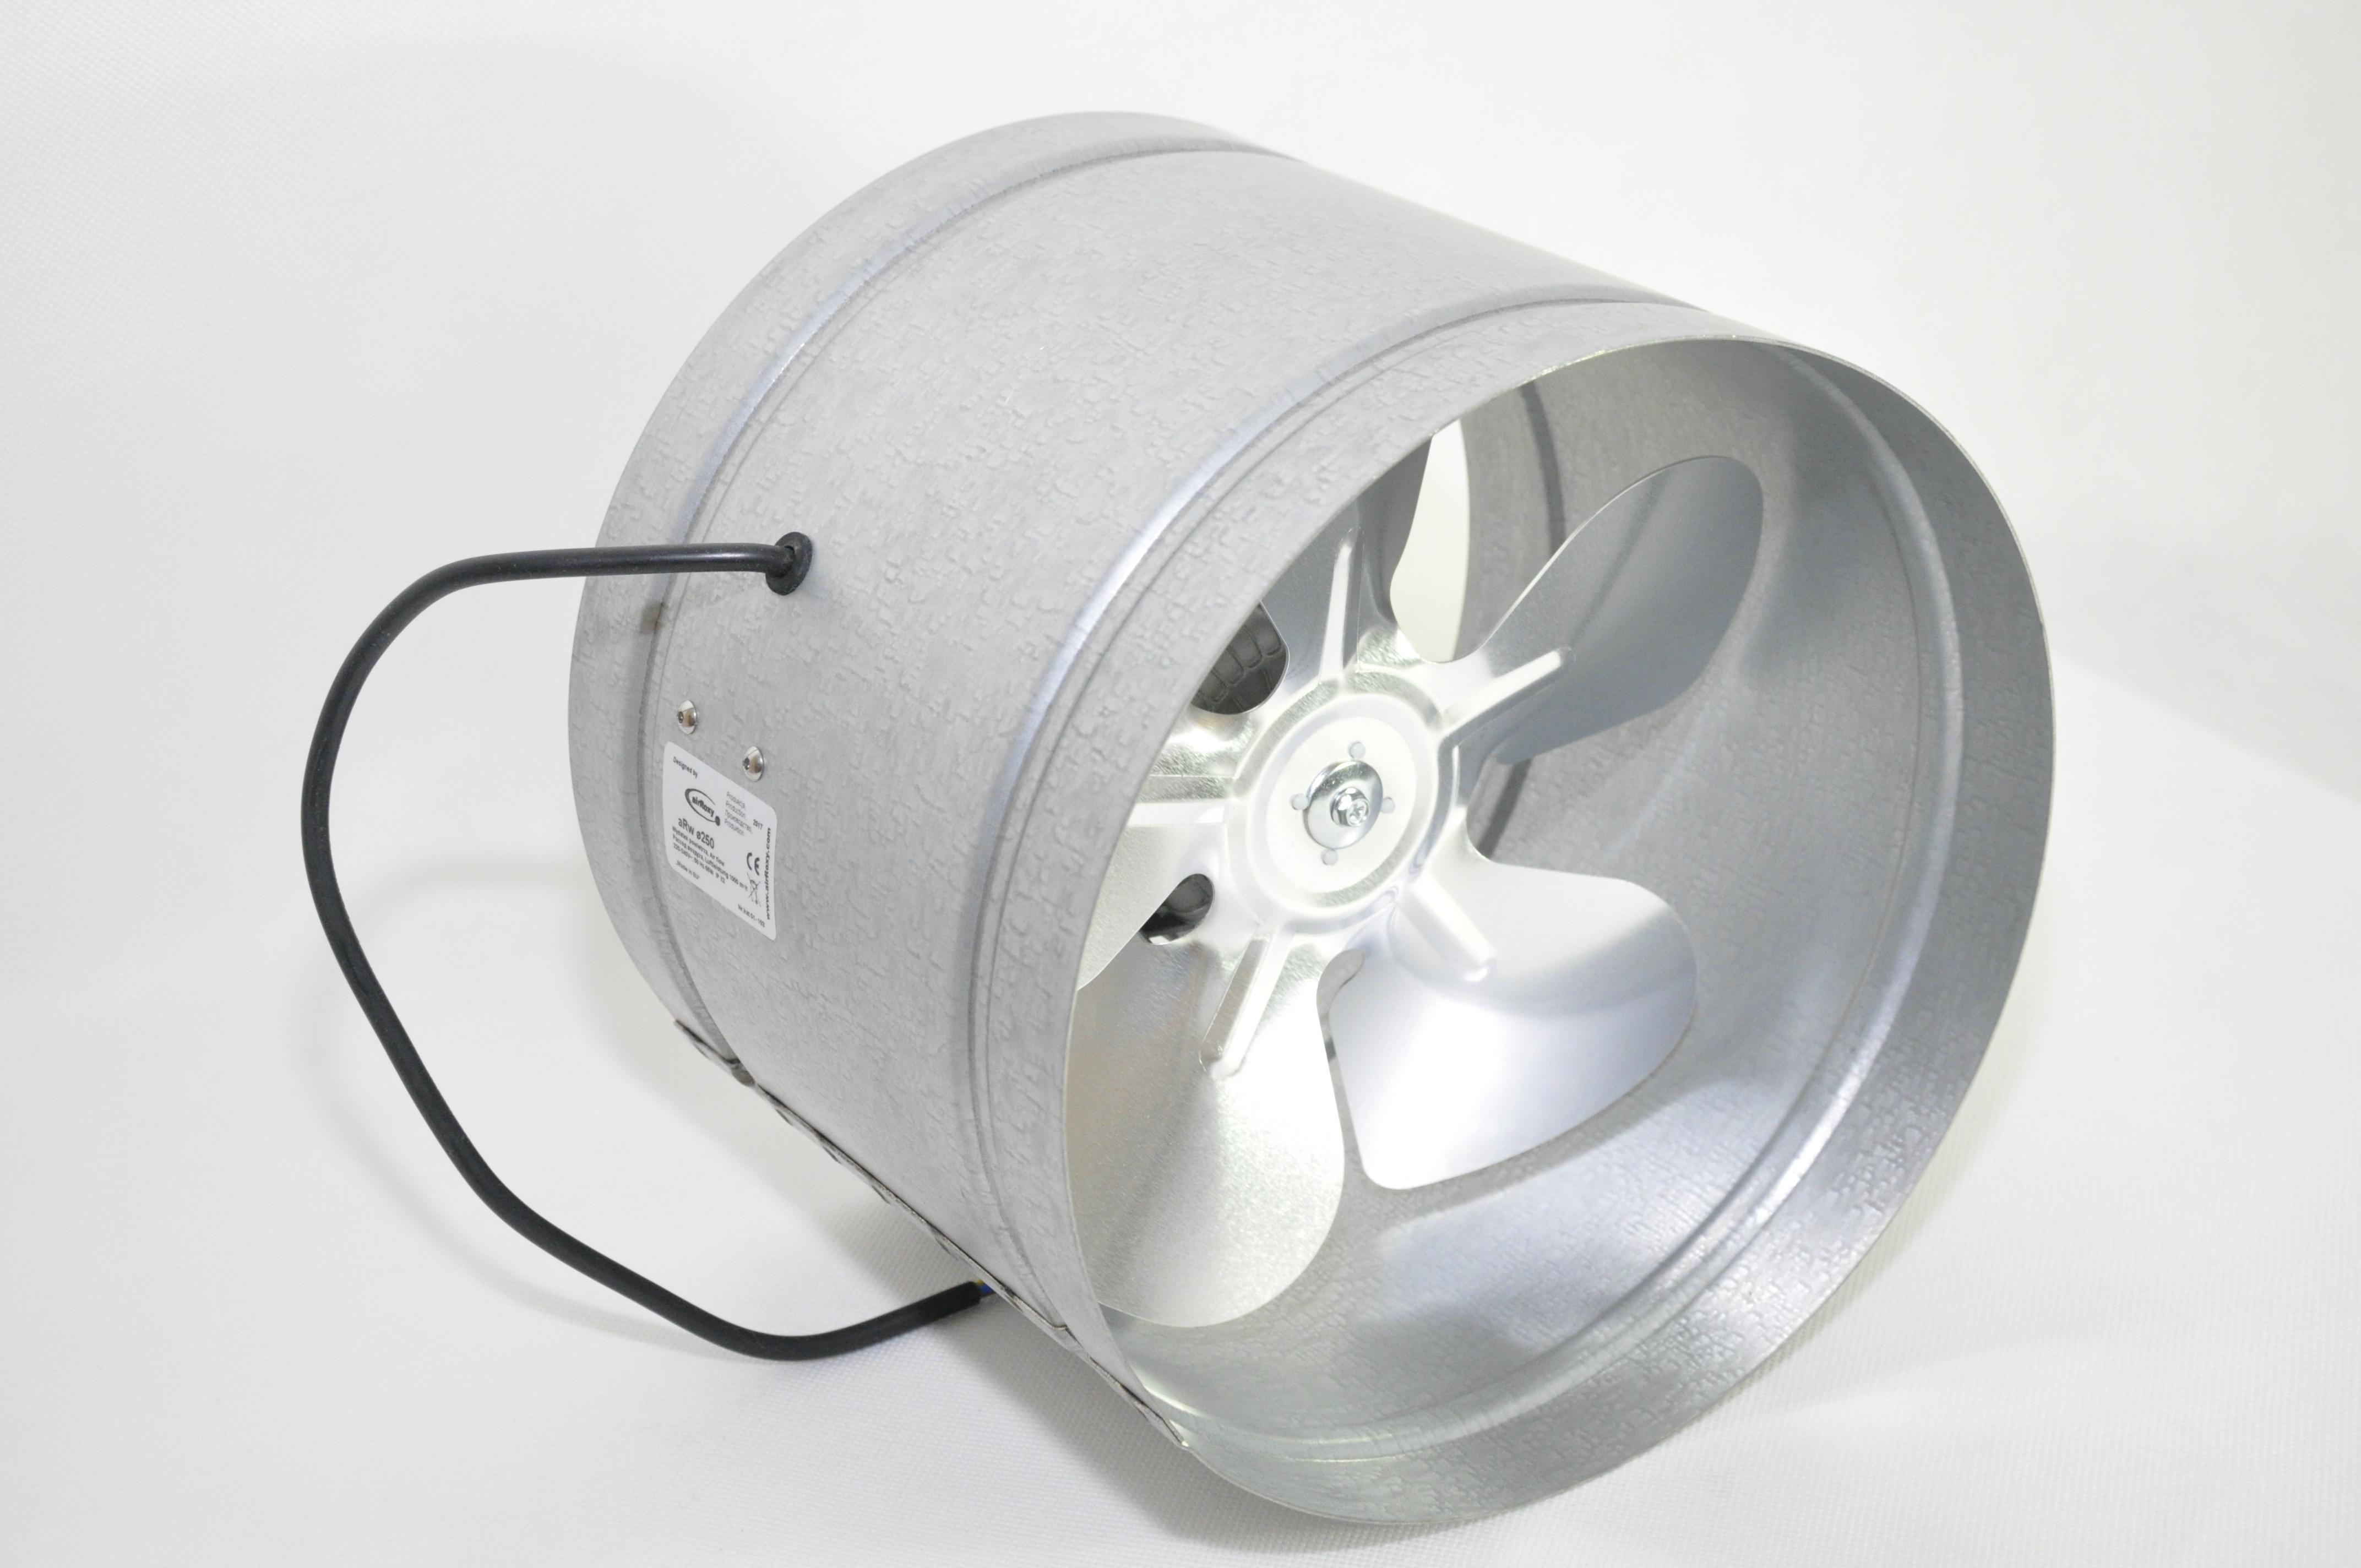 TURBO Rohrventilator Rohrlüfter Axial 100 125 150 160 200 250 315 355 Radial